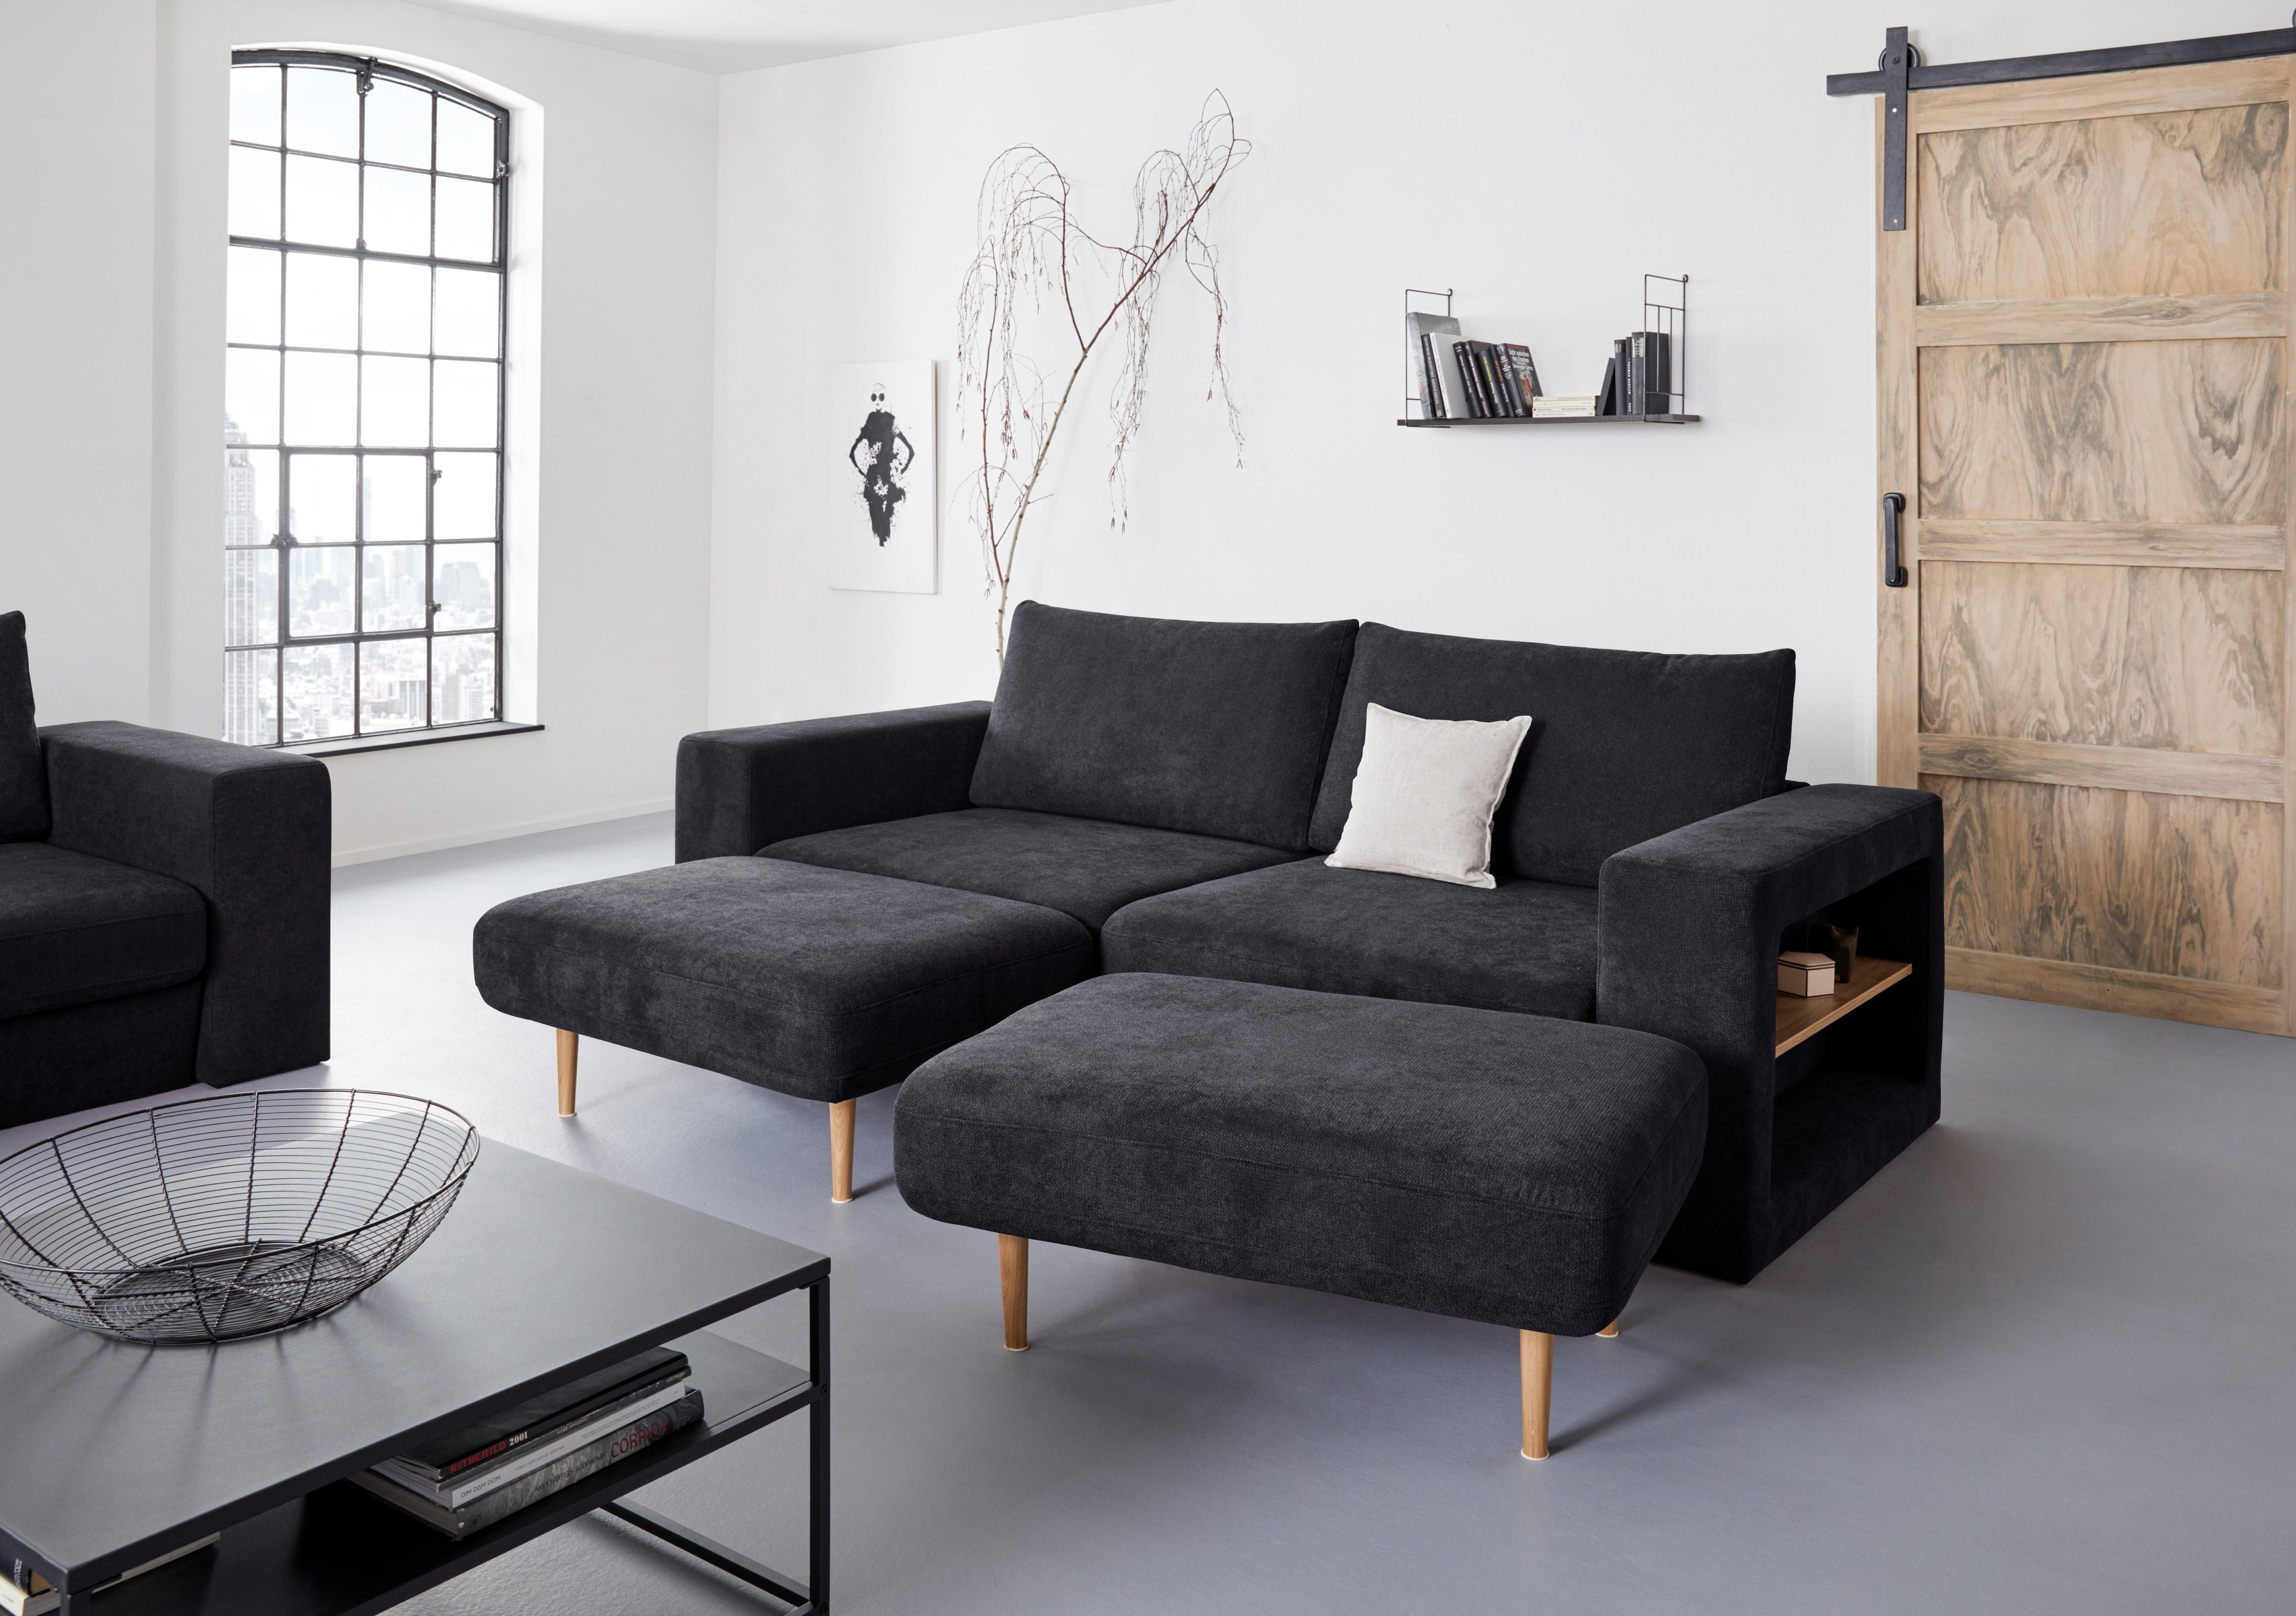 Looks By Wolfgang Joop 4 Sitzer Von Baur Sofa Haus Deko Blaues Sofa